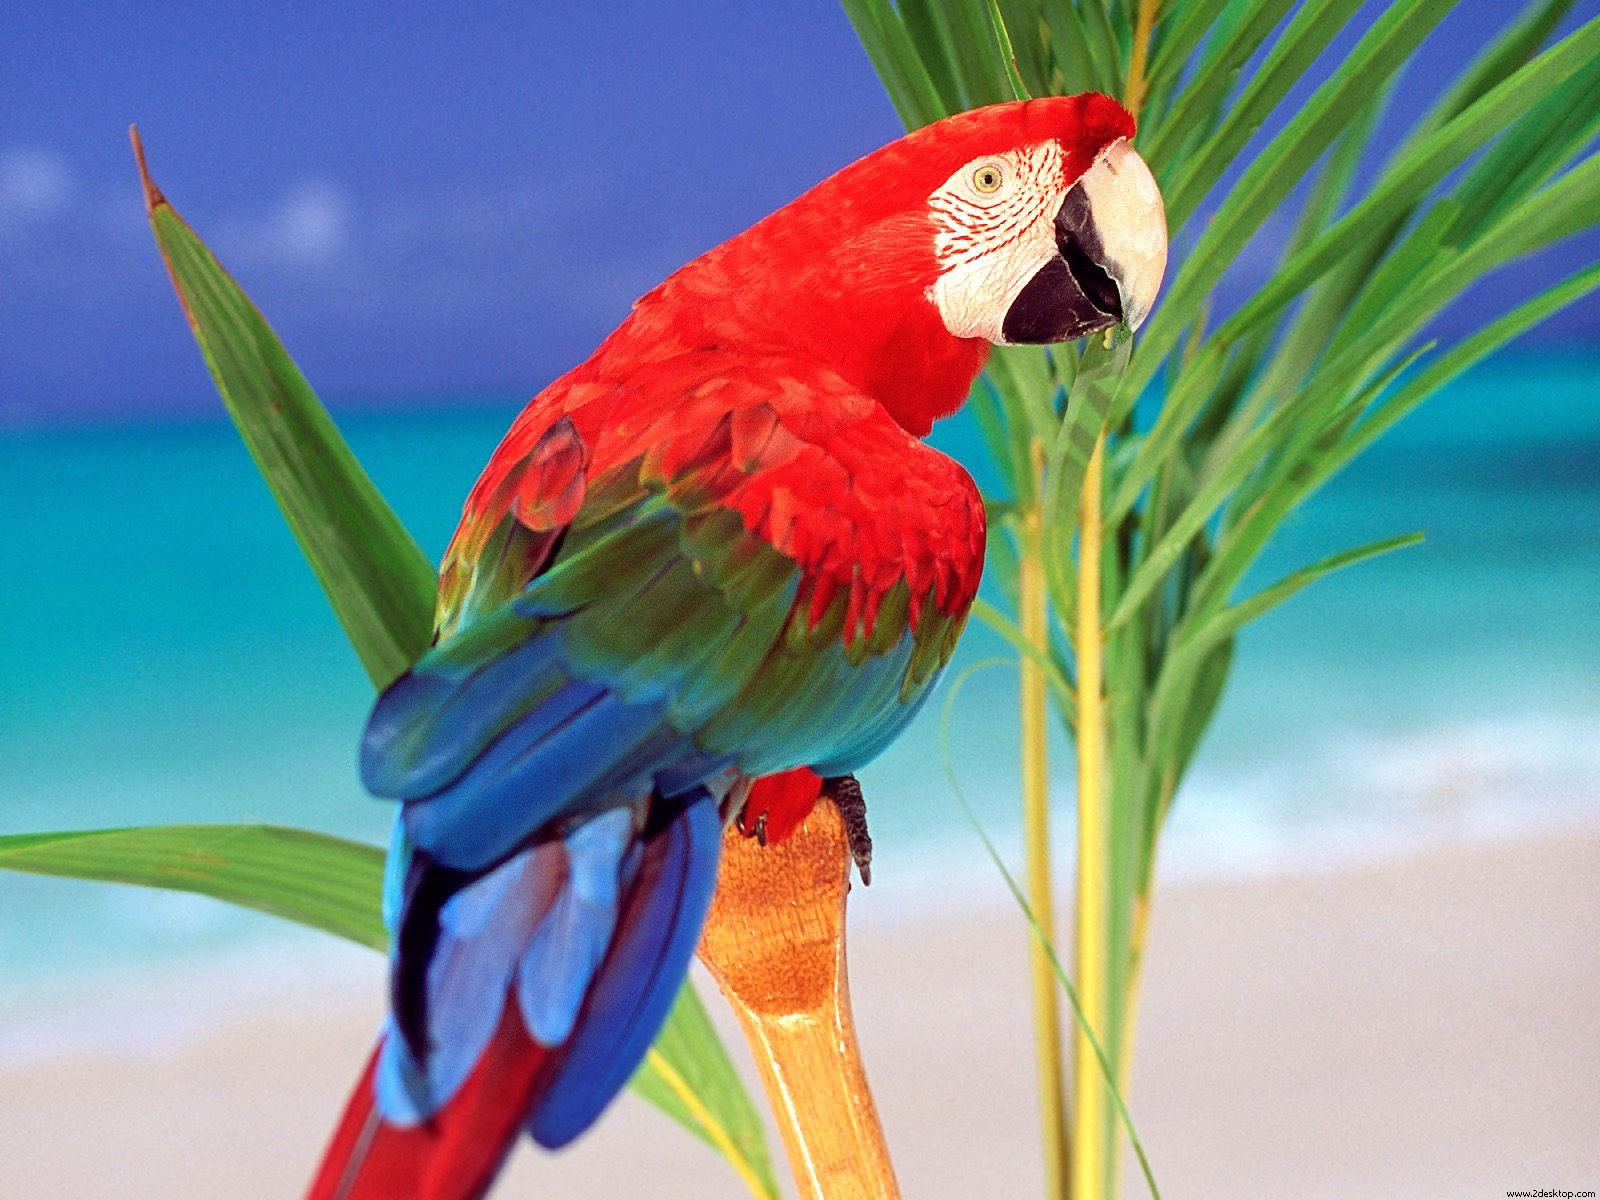 Download Wallpaper Love Parrot - Parrots-Pictures-Wallpapers-064  Picture_999927.jpg